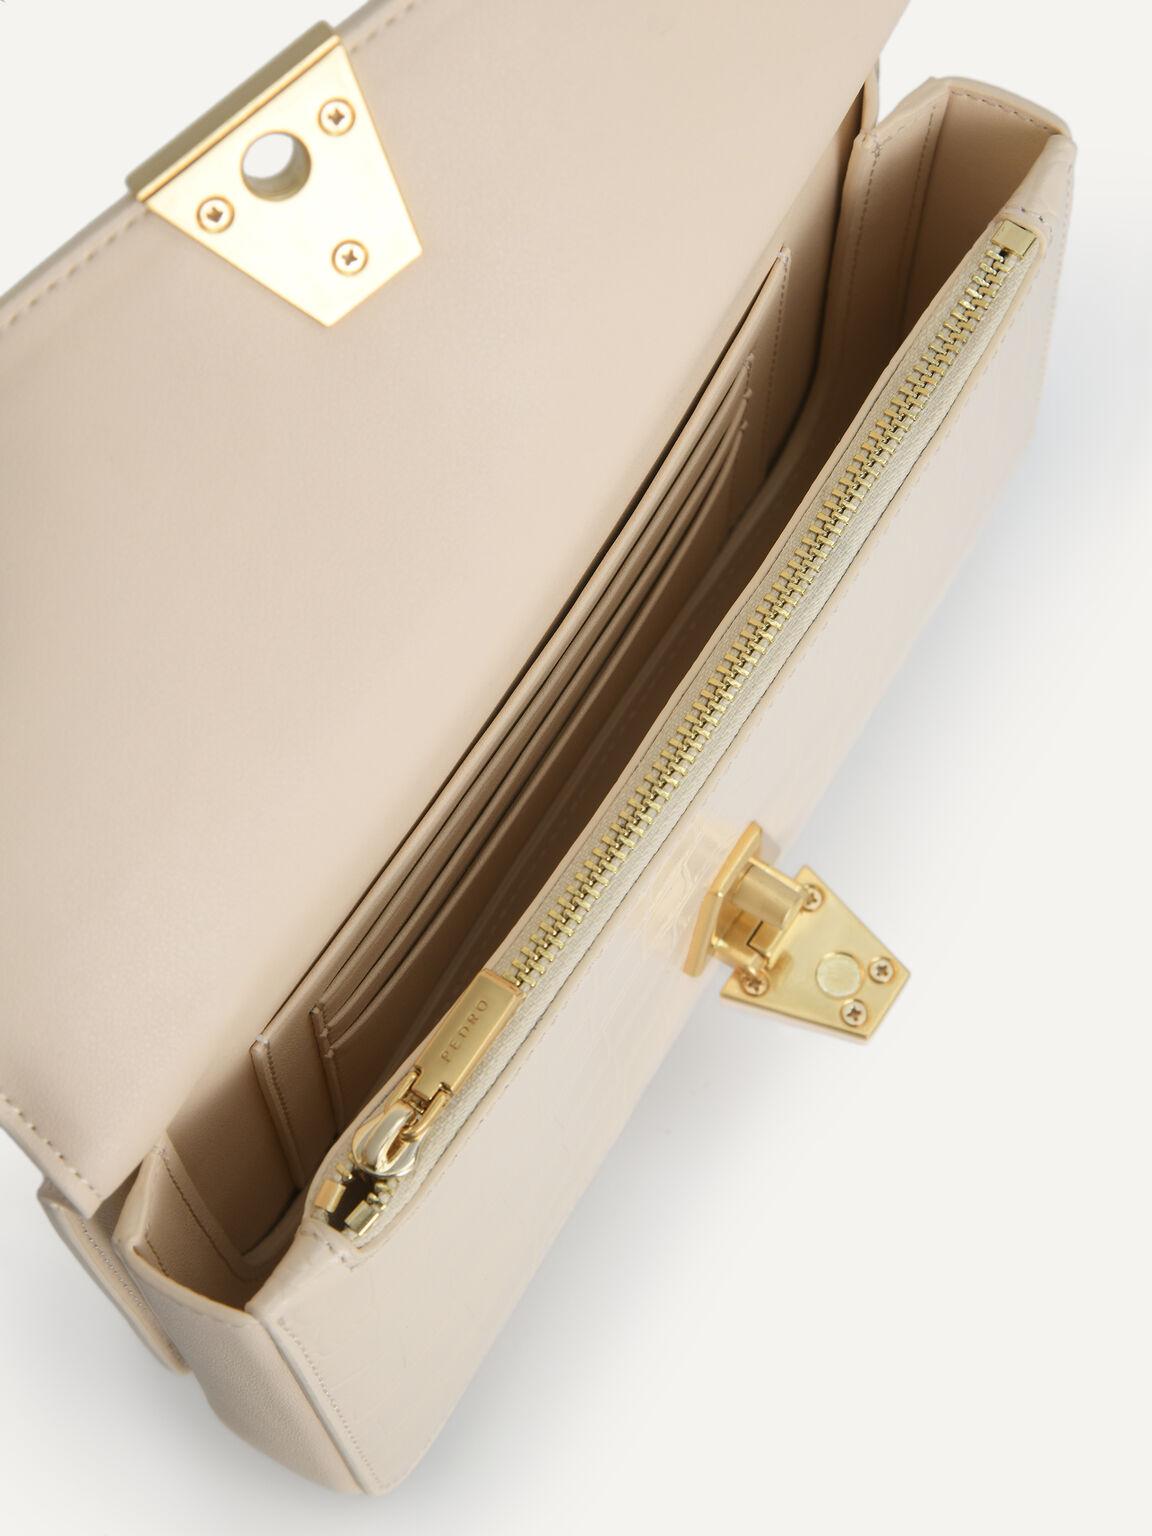 Textured Leather Travel Organiser, Beige, hi-res